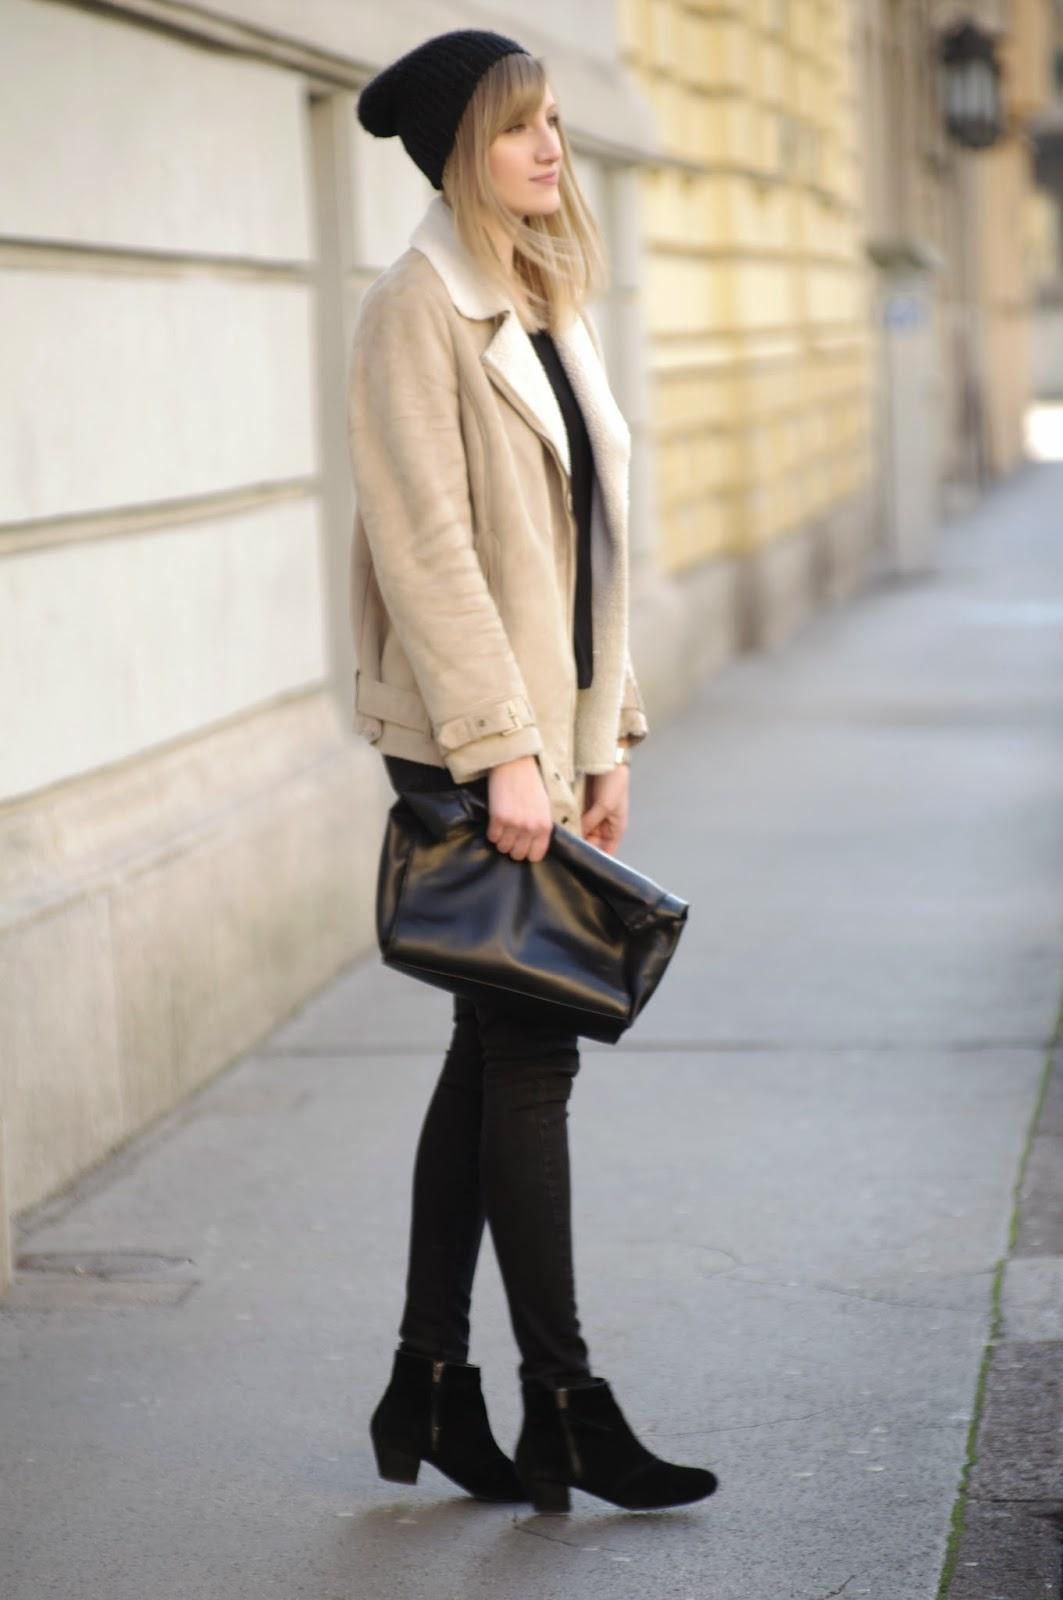 beige wool jacket H&M, acne sheinside beige sheep jacket, black zara denim, black suede boots promod, black beanie outfit, style blog blogger, fashion blogger, ootd